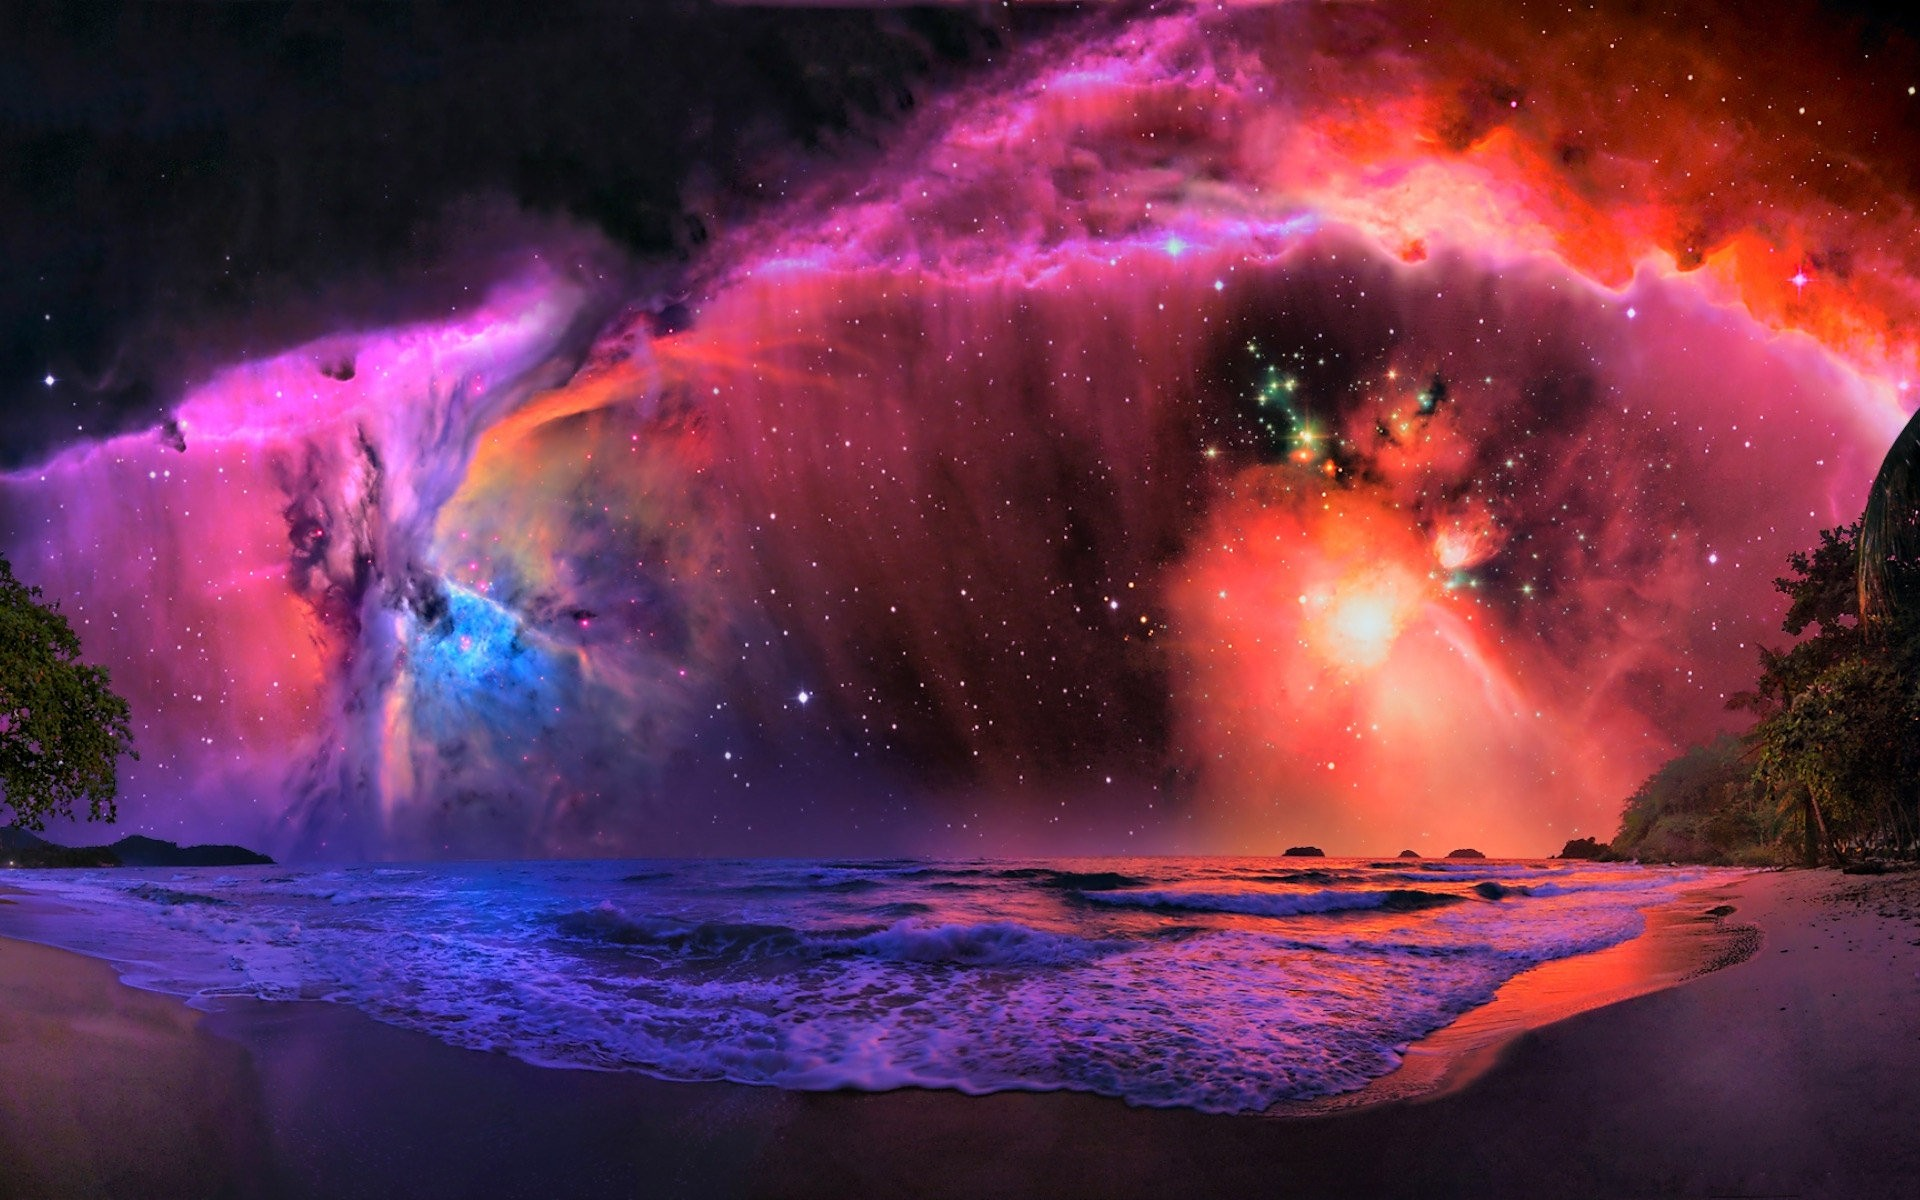 galaxy wallpaper tumblr hd - photo #18